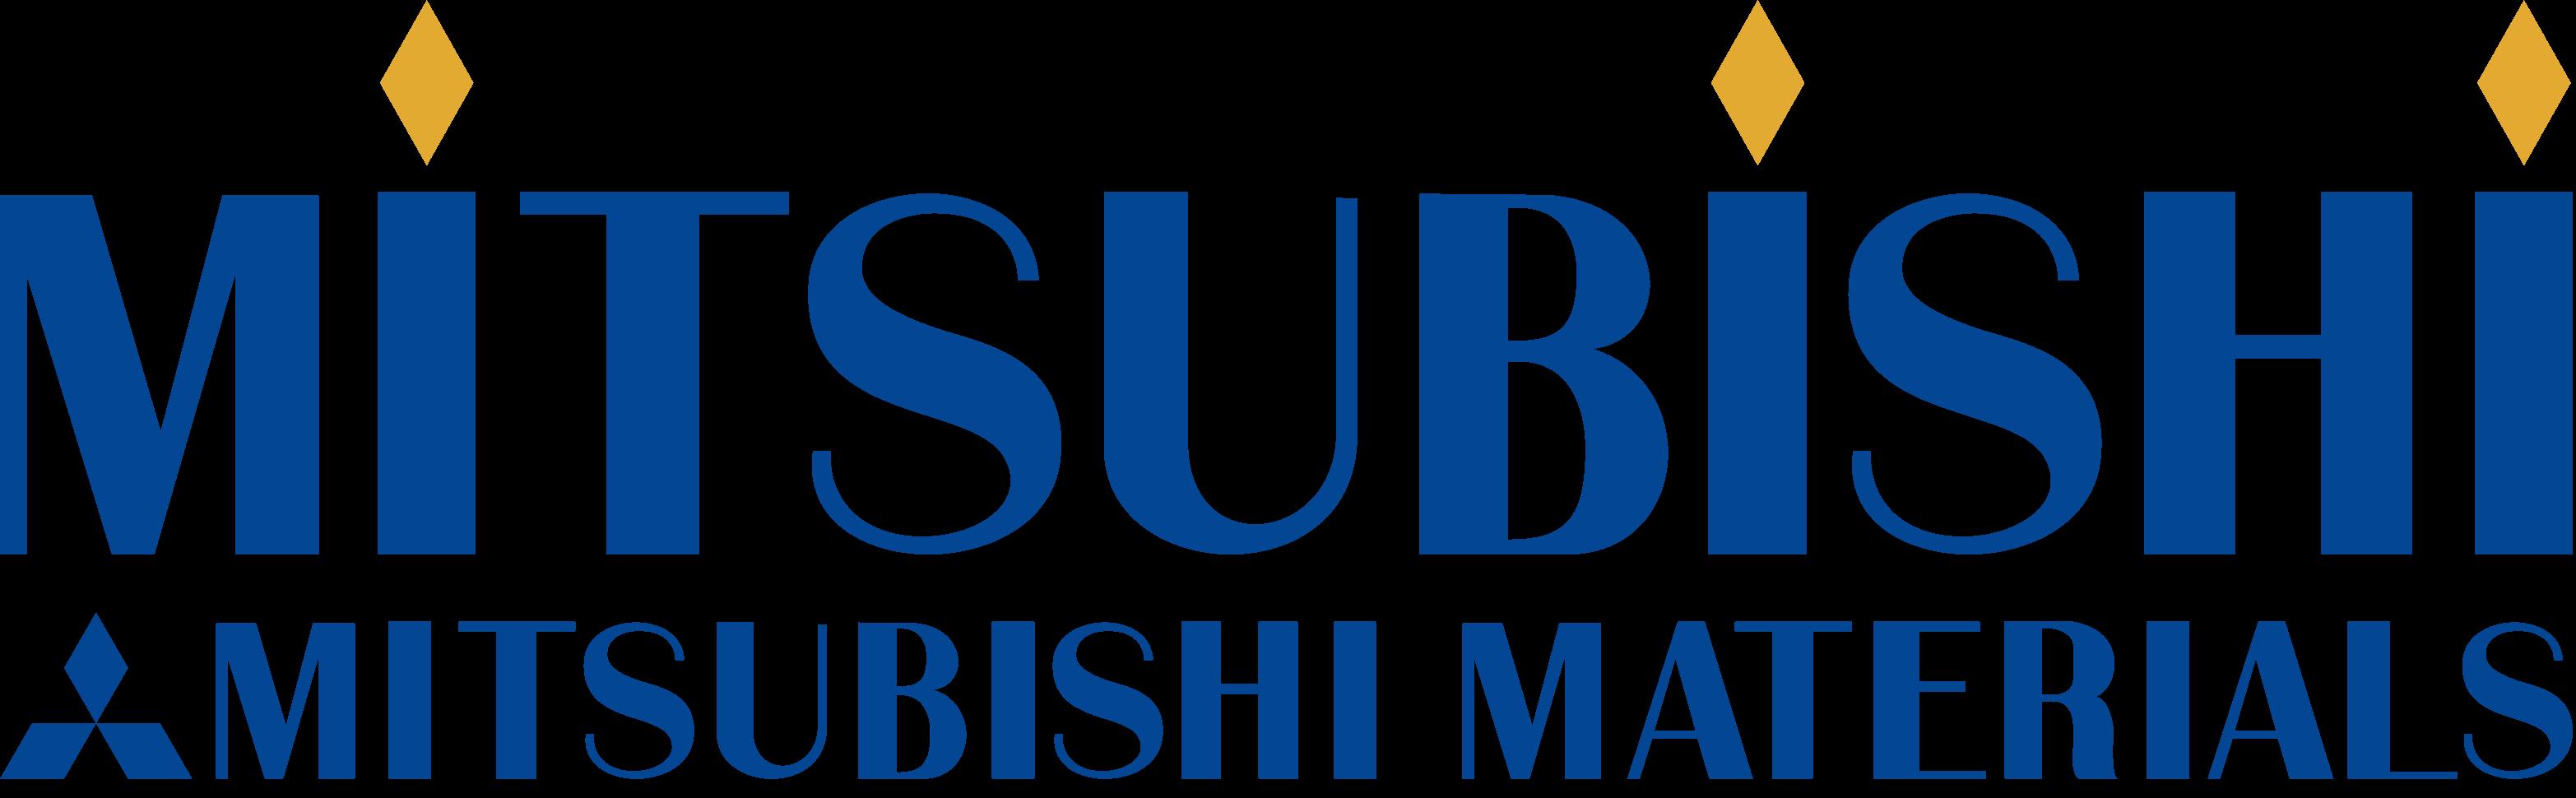 logo-novo-mitsubishi-materials-copy